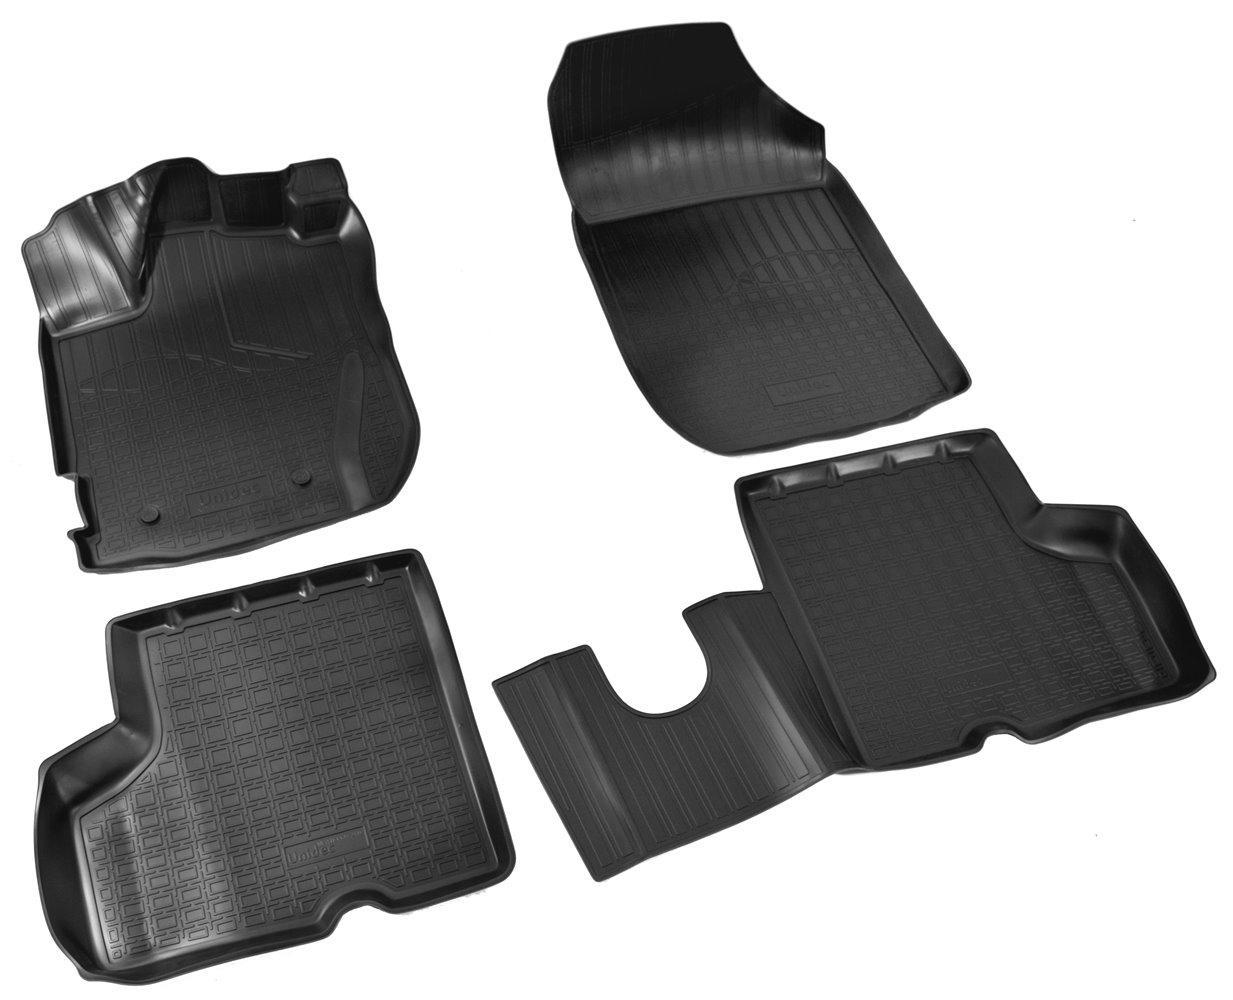 Килимки в салон для Renault Kaptur 3D (16-) (полиур., компл - 4шт) NPA11-C69-240